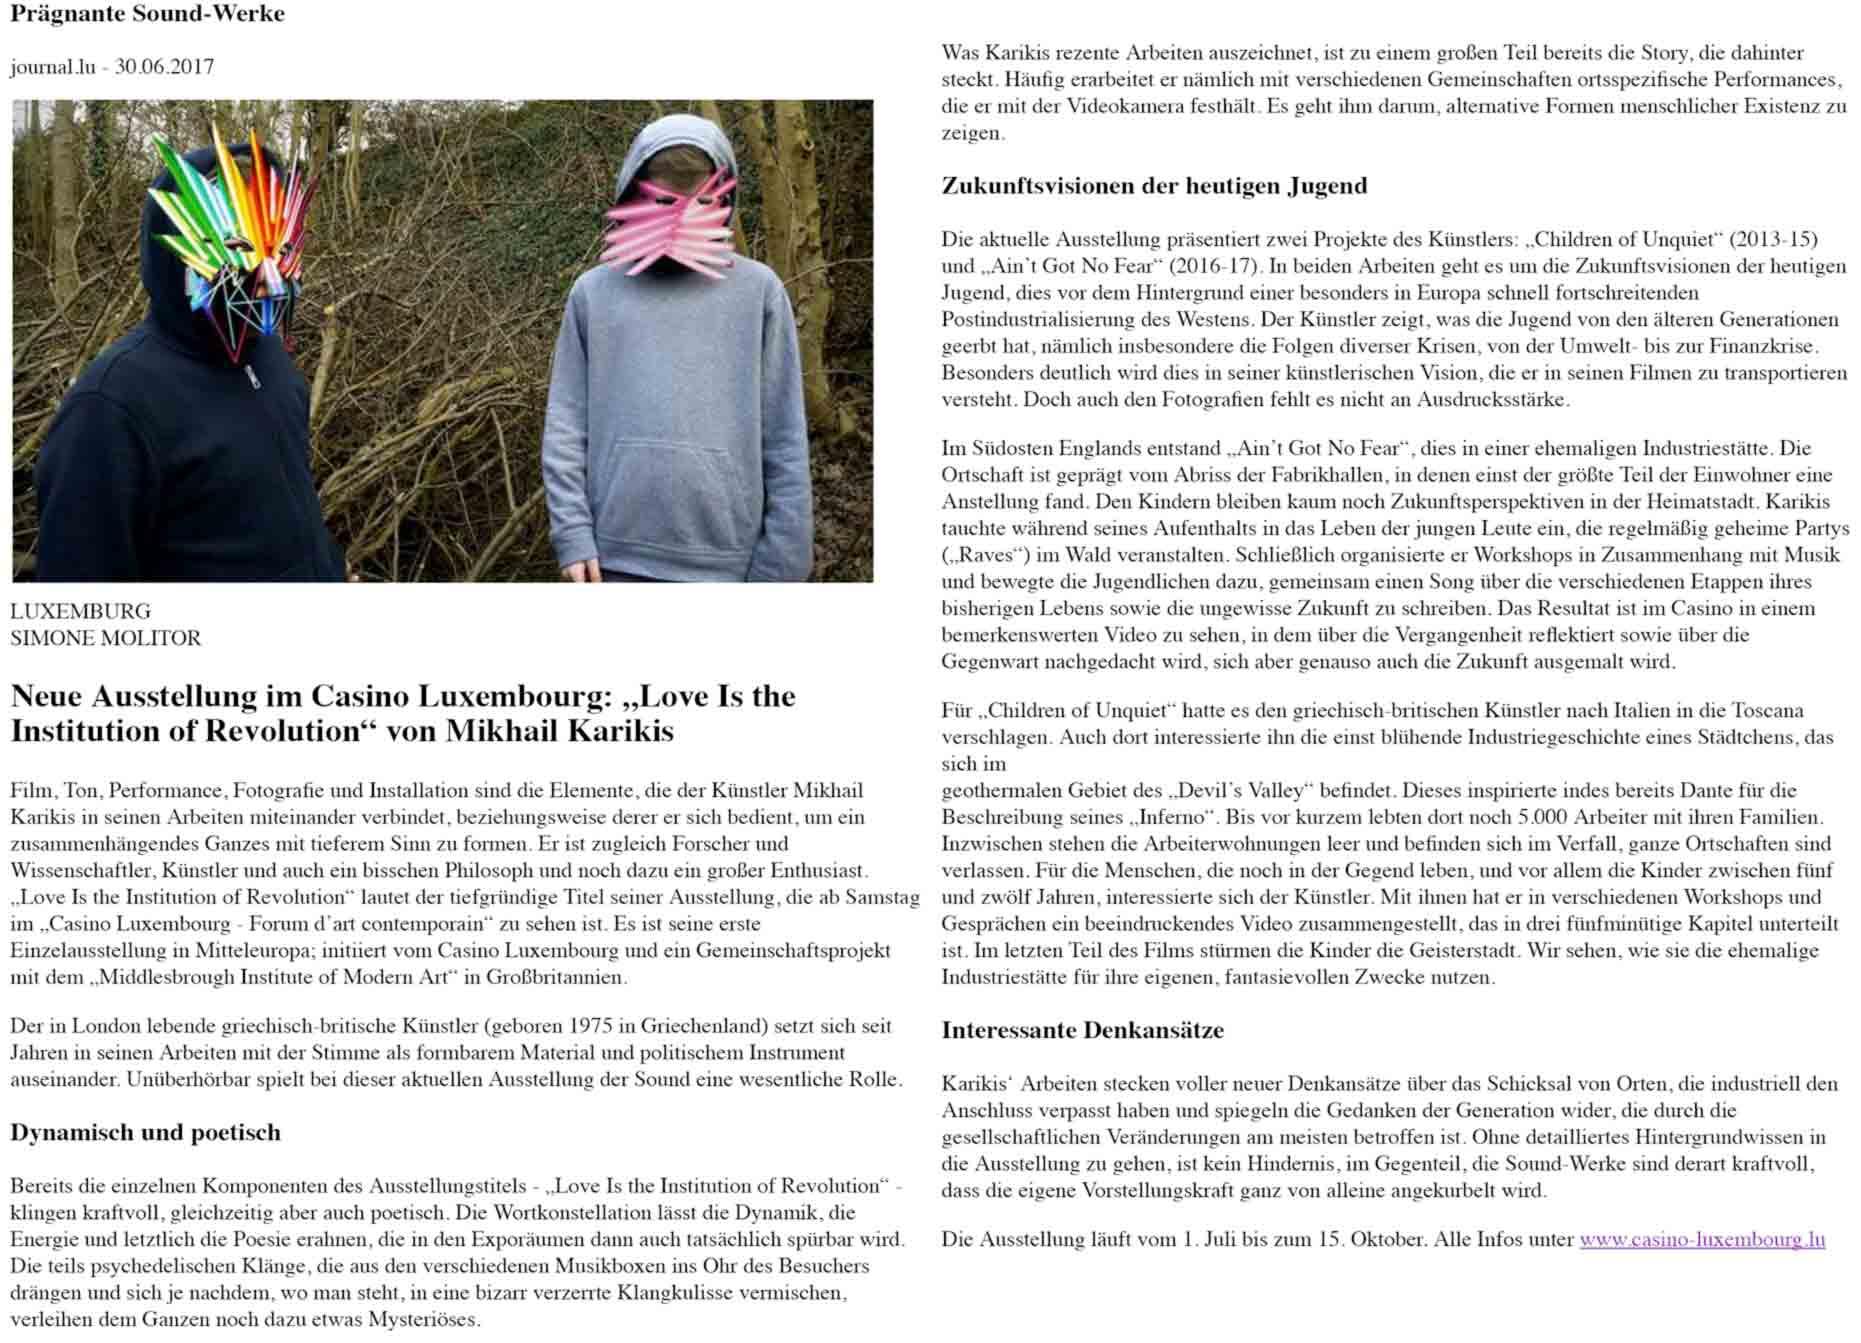 Mikhail-Karikis-Letzebuerger-Journal-Review